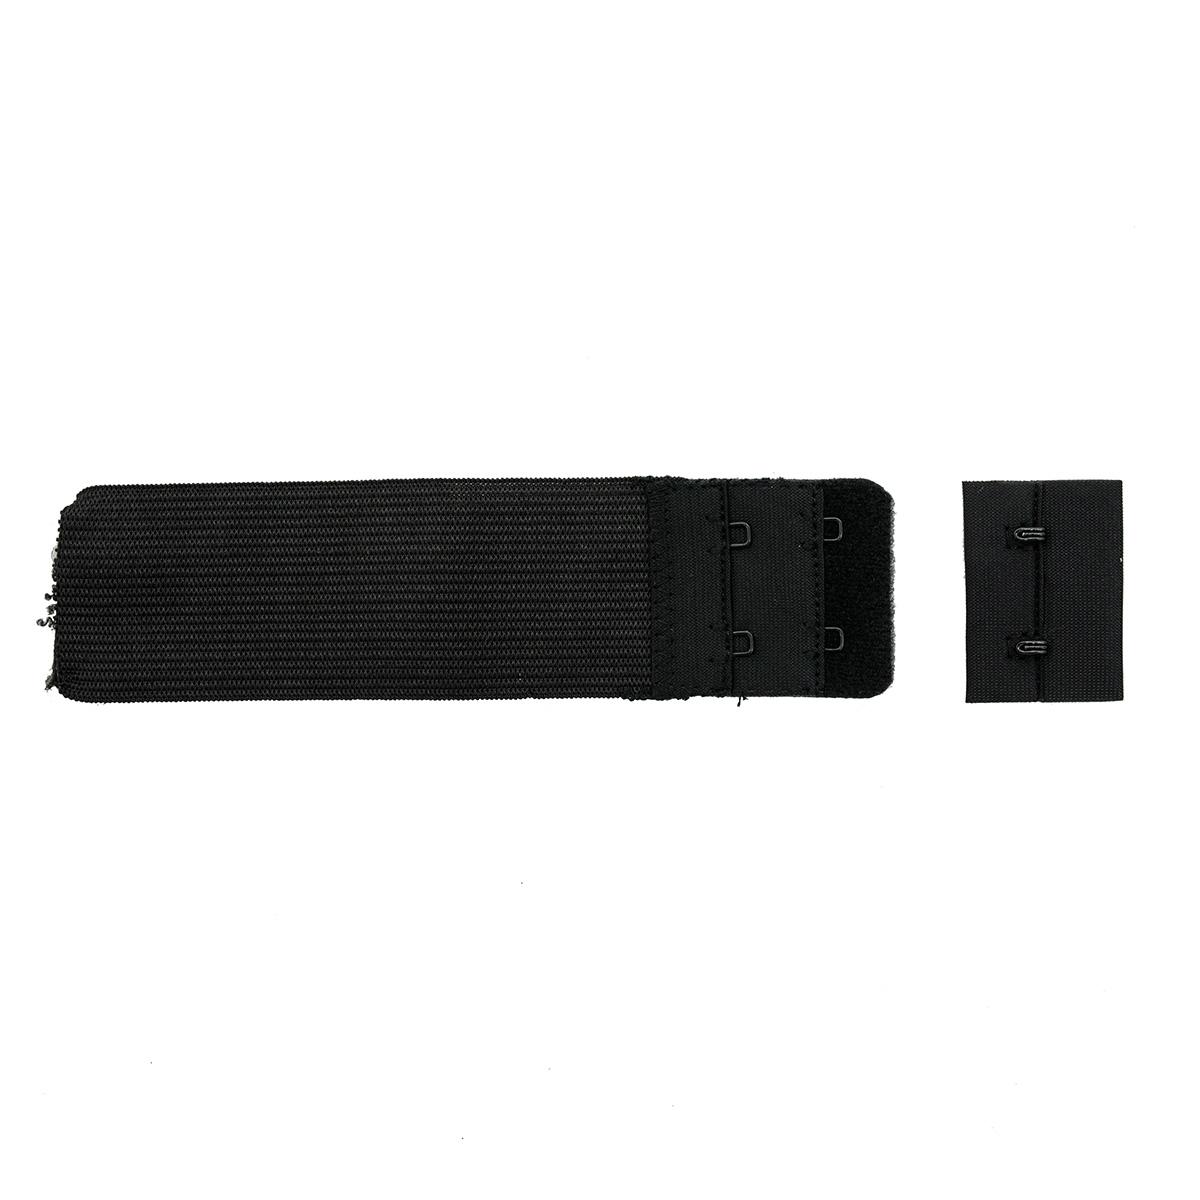 852101 Застежка для бюстгальтера, черный, 38 мм, 2 крючка, Hobby&Pro